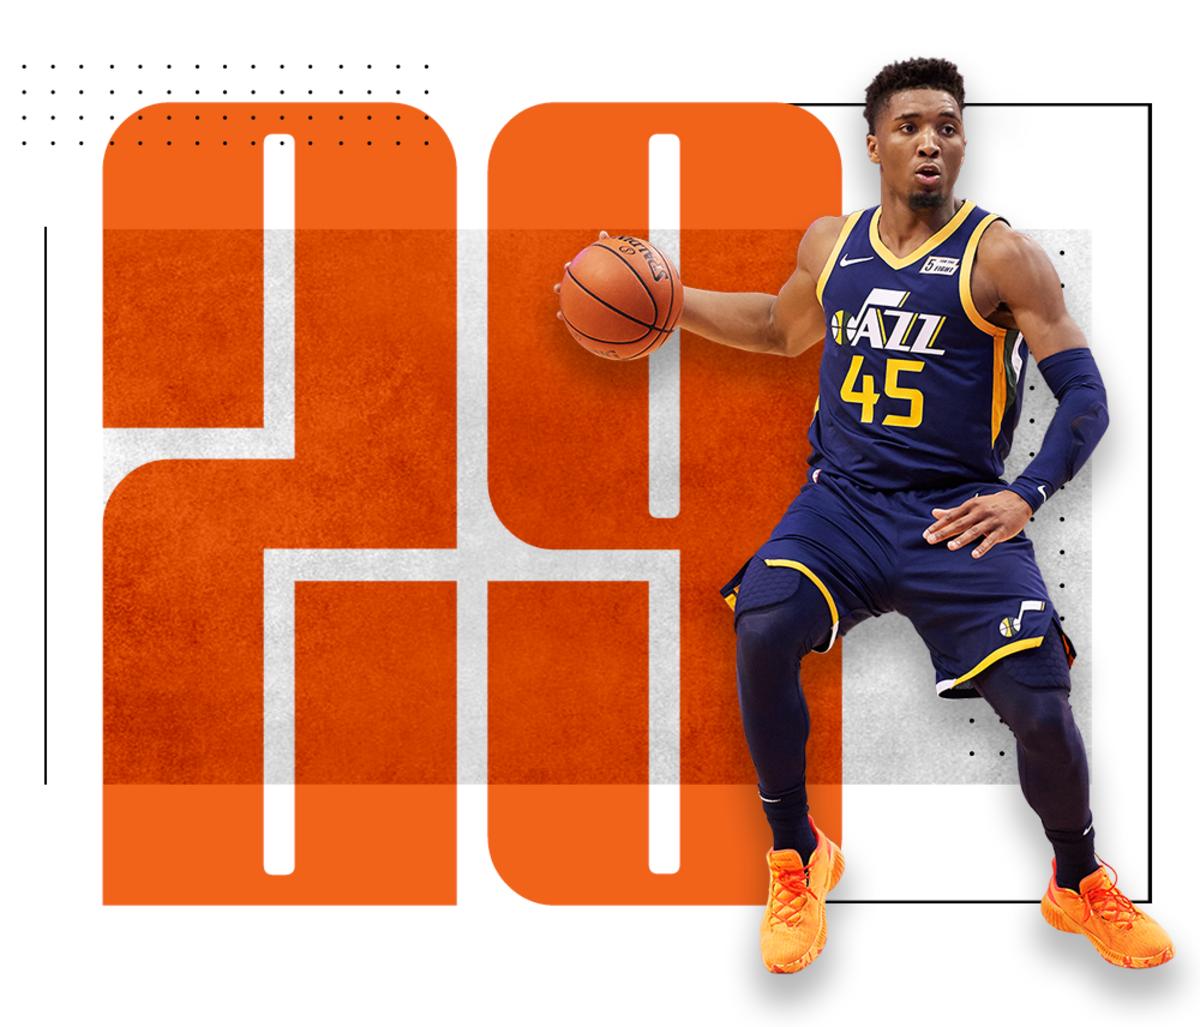 top-100-nba-players-2020-Donovan-Mitchell.png